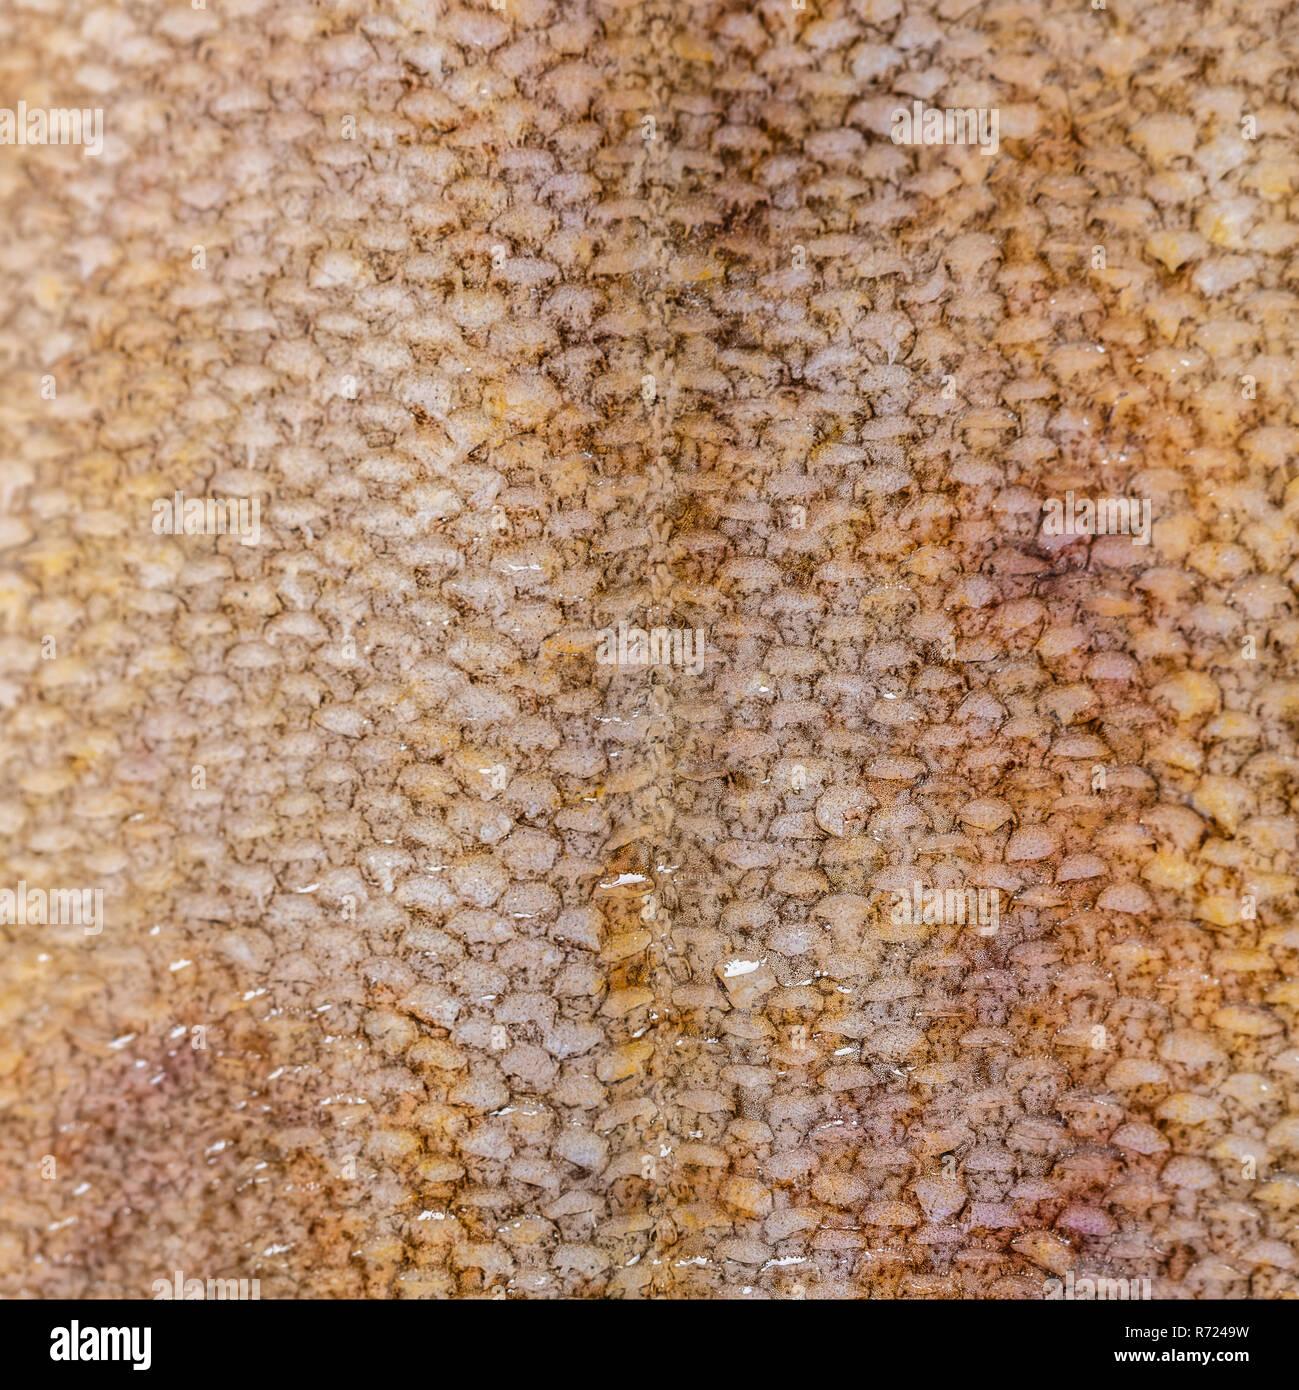 food background, flounder fish scales texture closeup - Stock Image